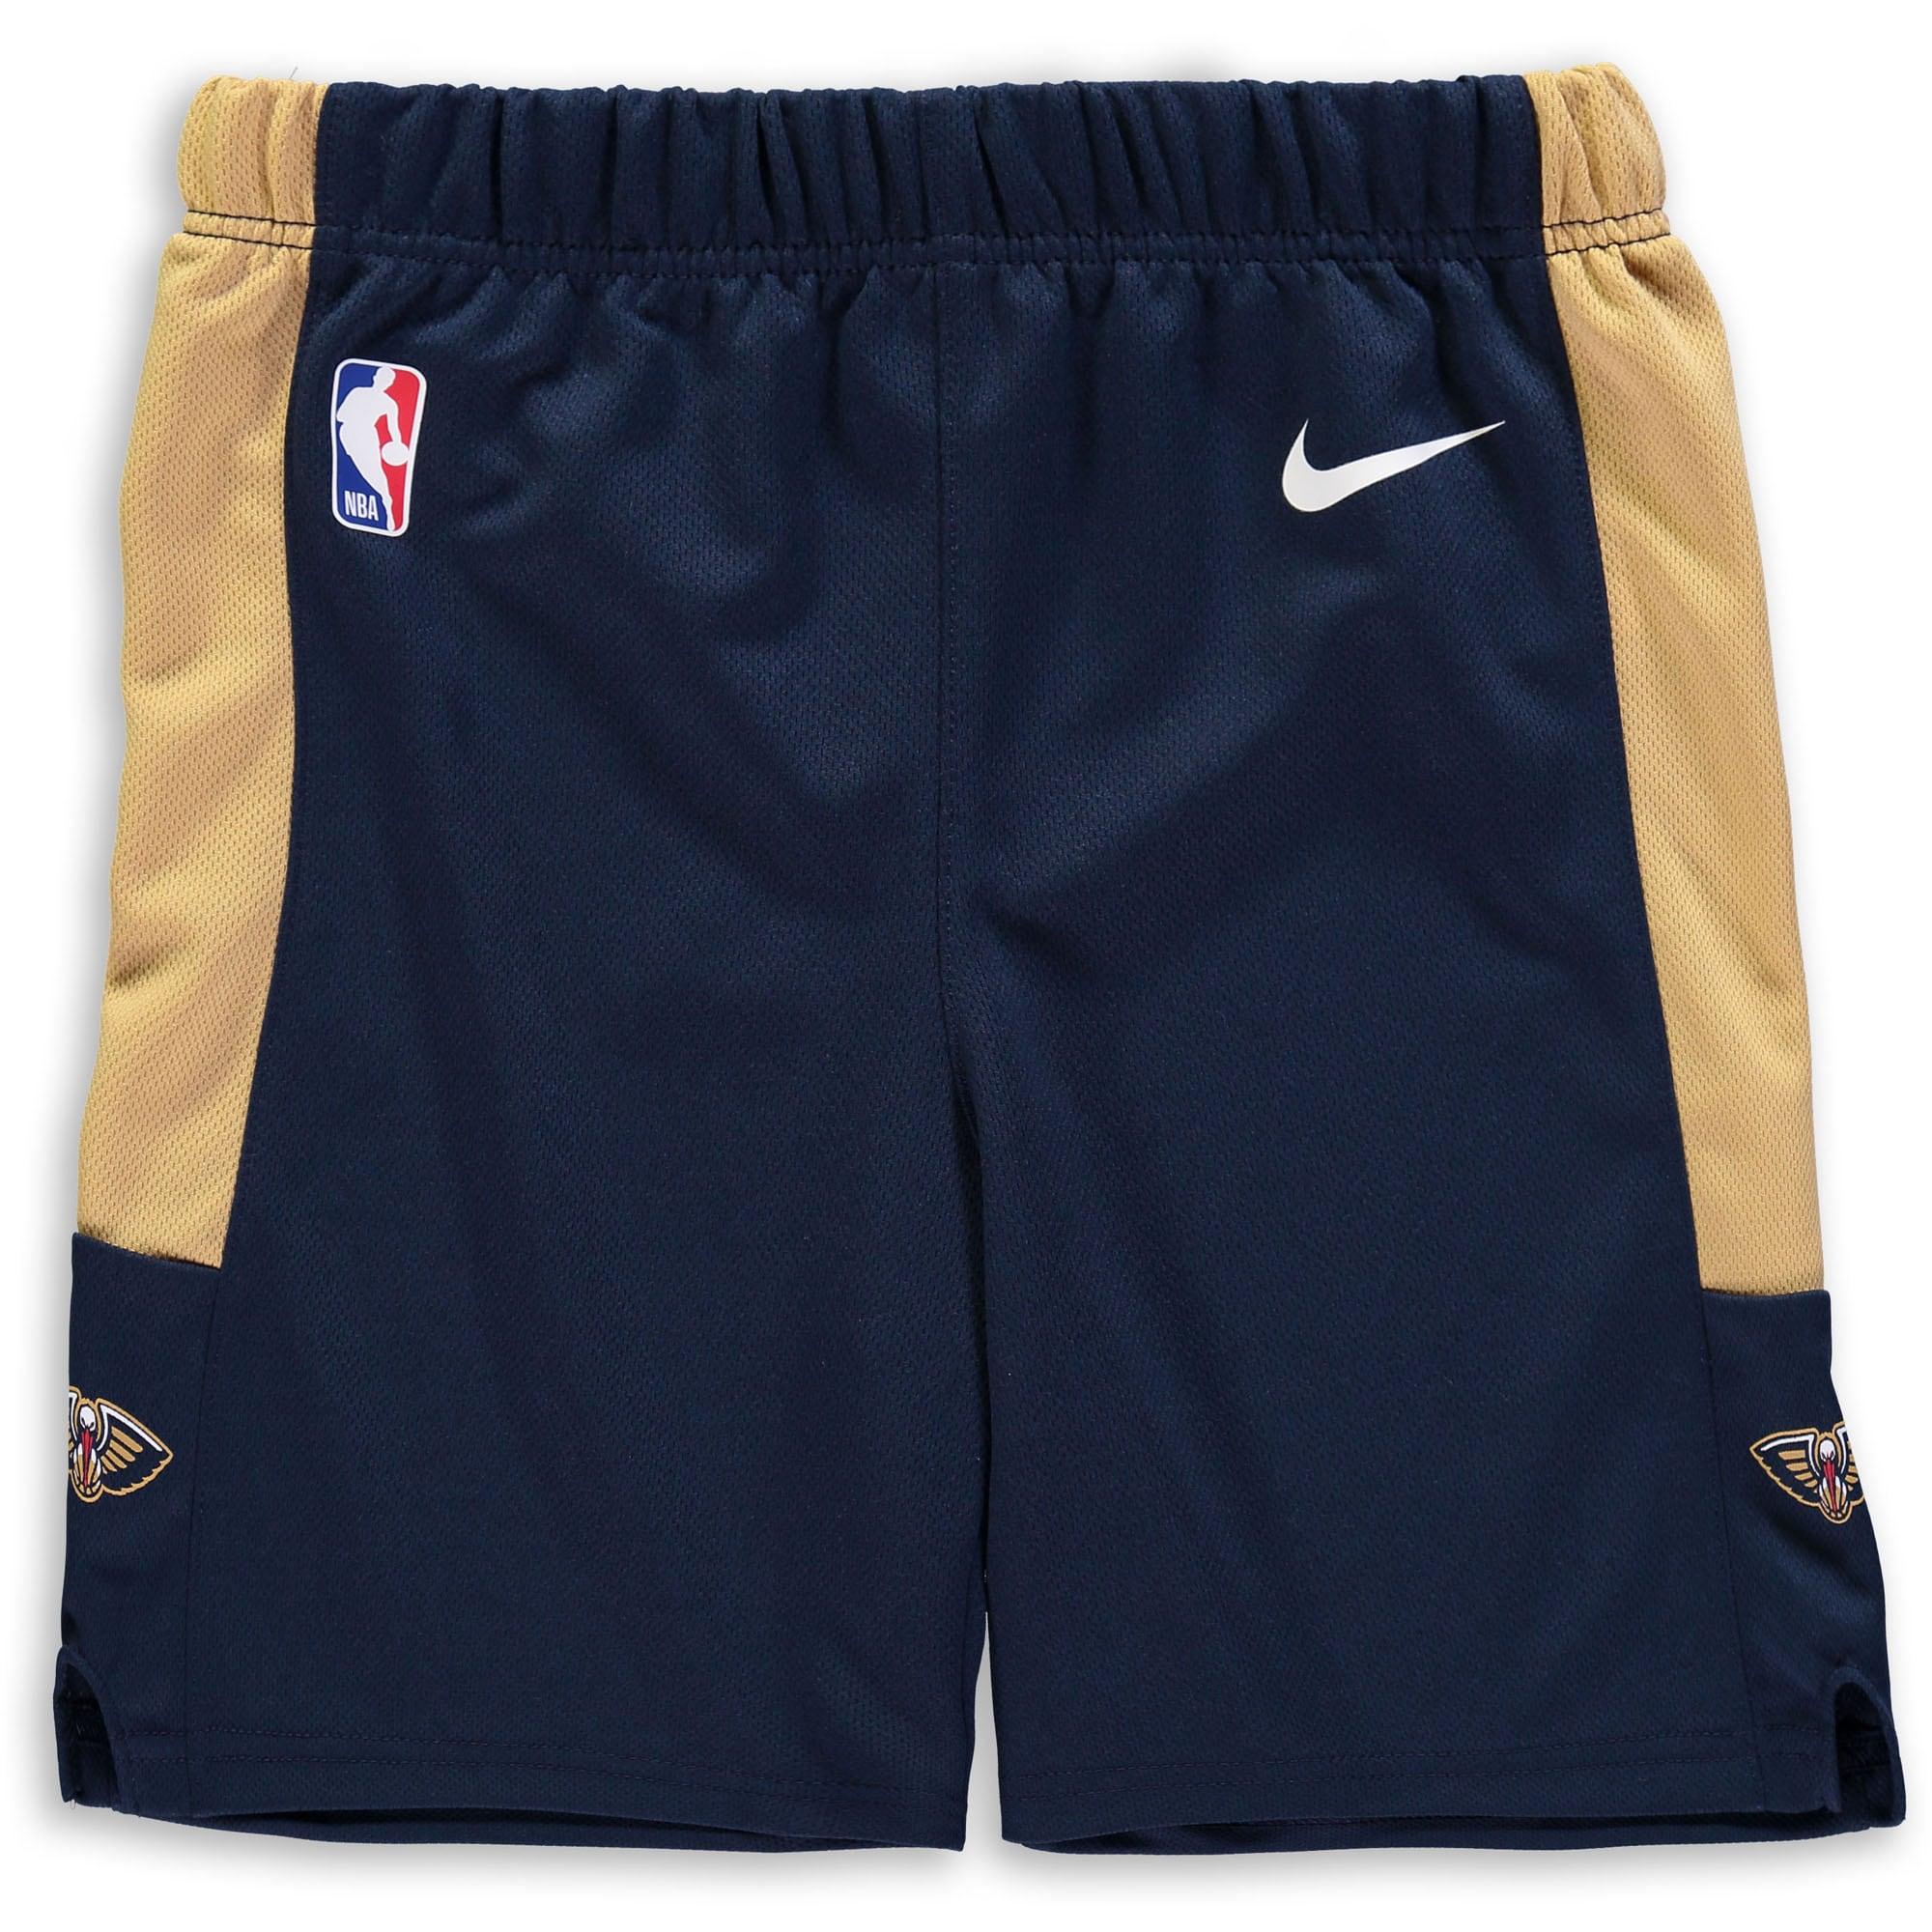 New Orleans Pelicans Nike Preschool Icon Replica Team Shorts - Navy